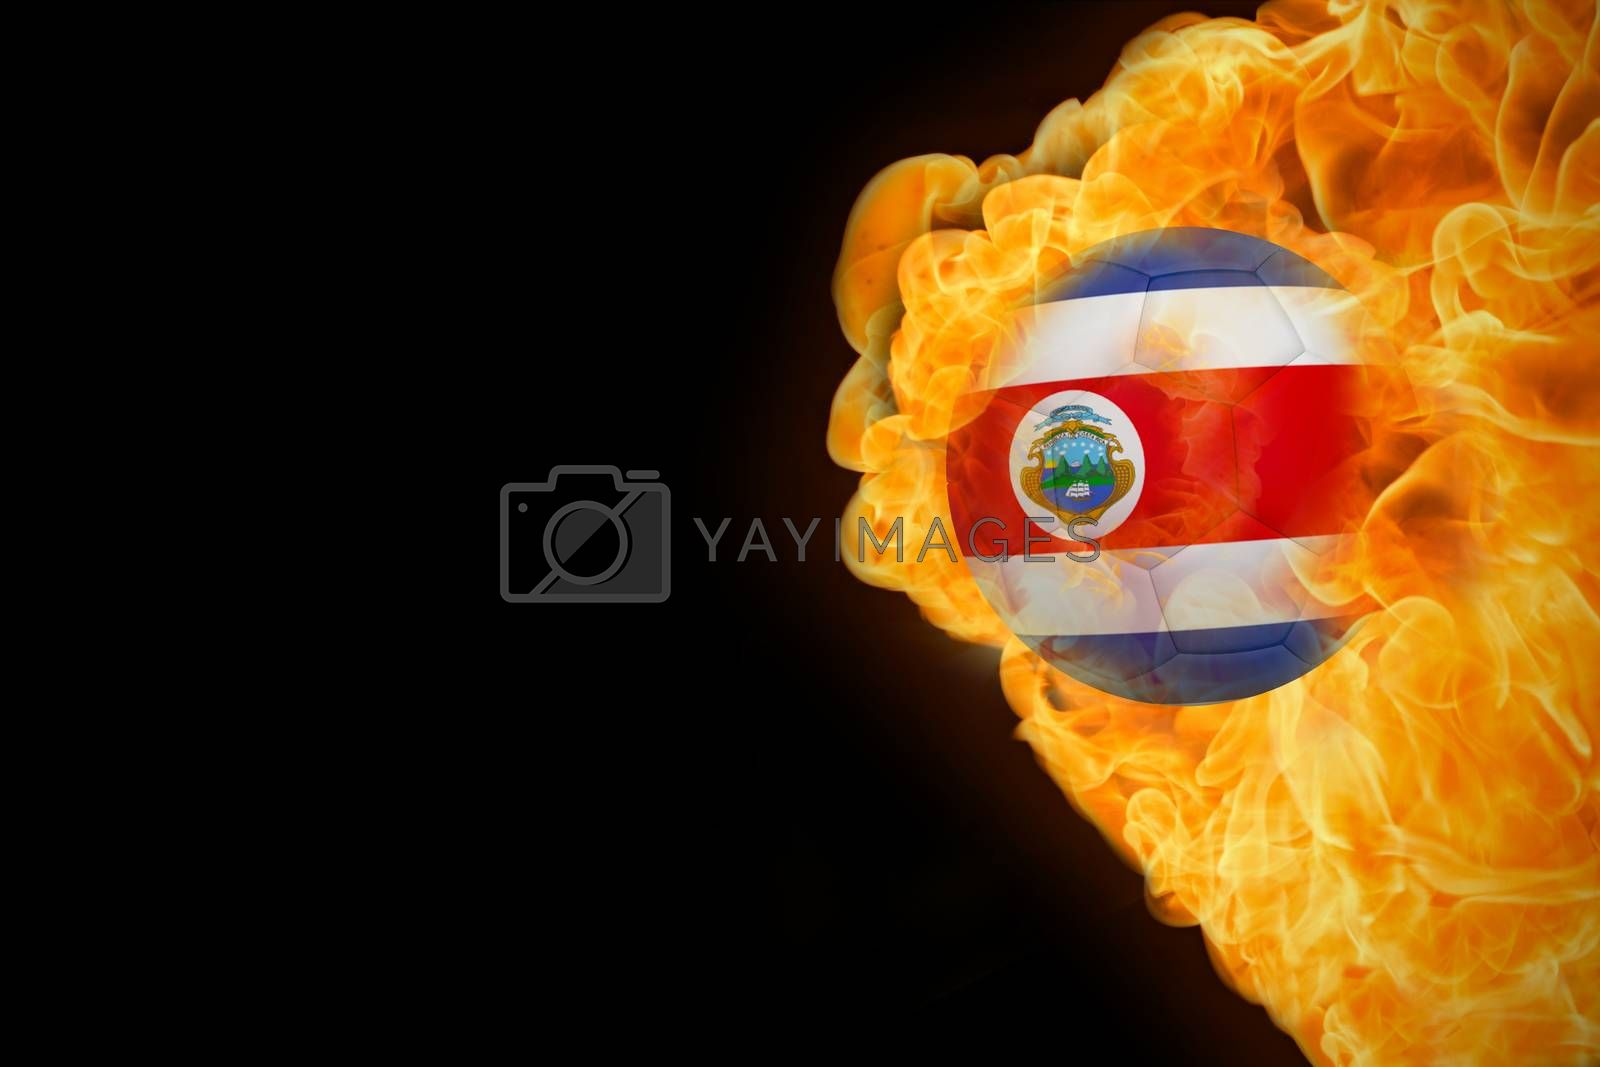 Fire surrounding costa rica flag football by Wavebreakmedia